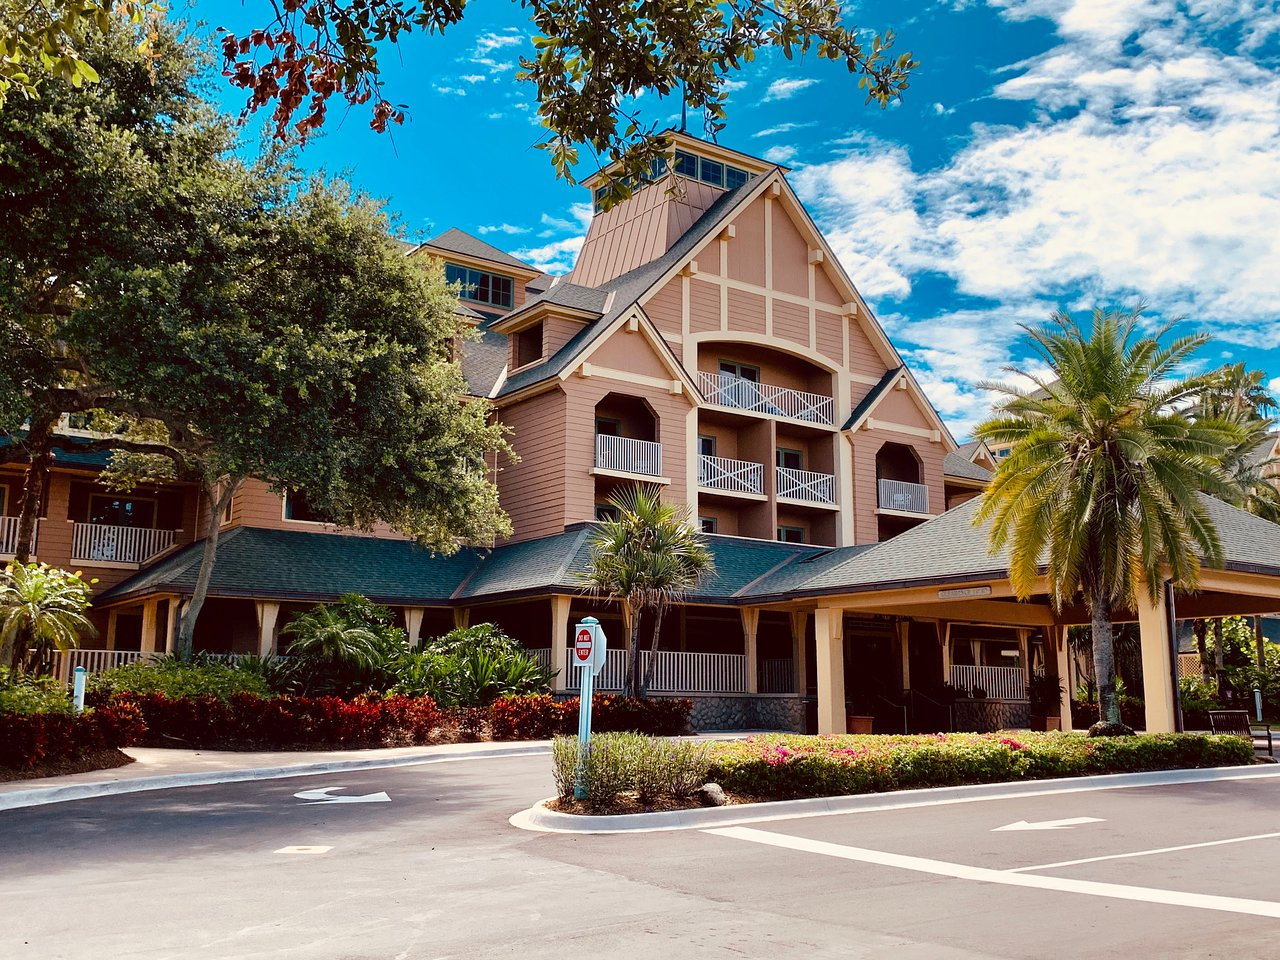 Disney's Vero Beach Resort Entrance